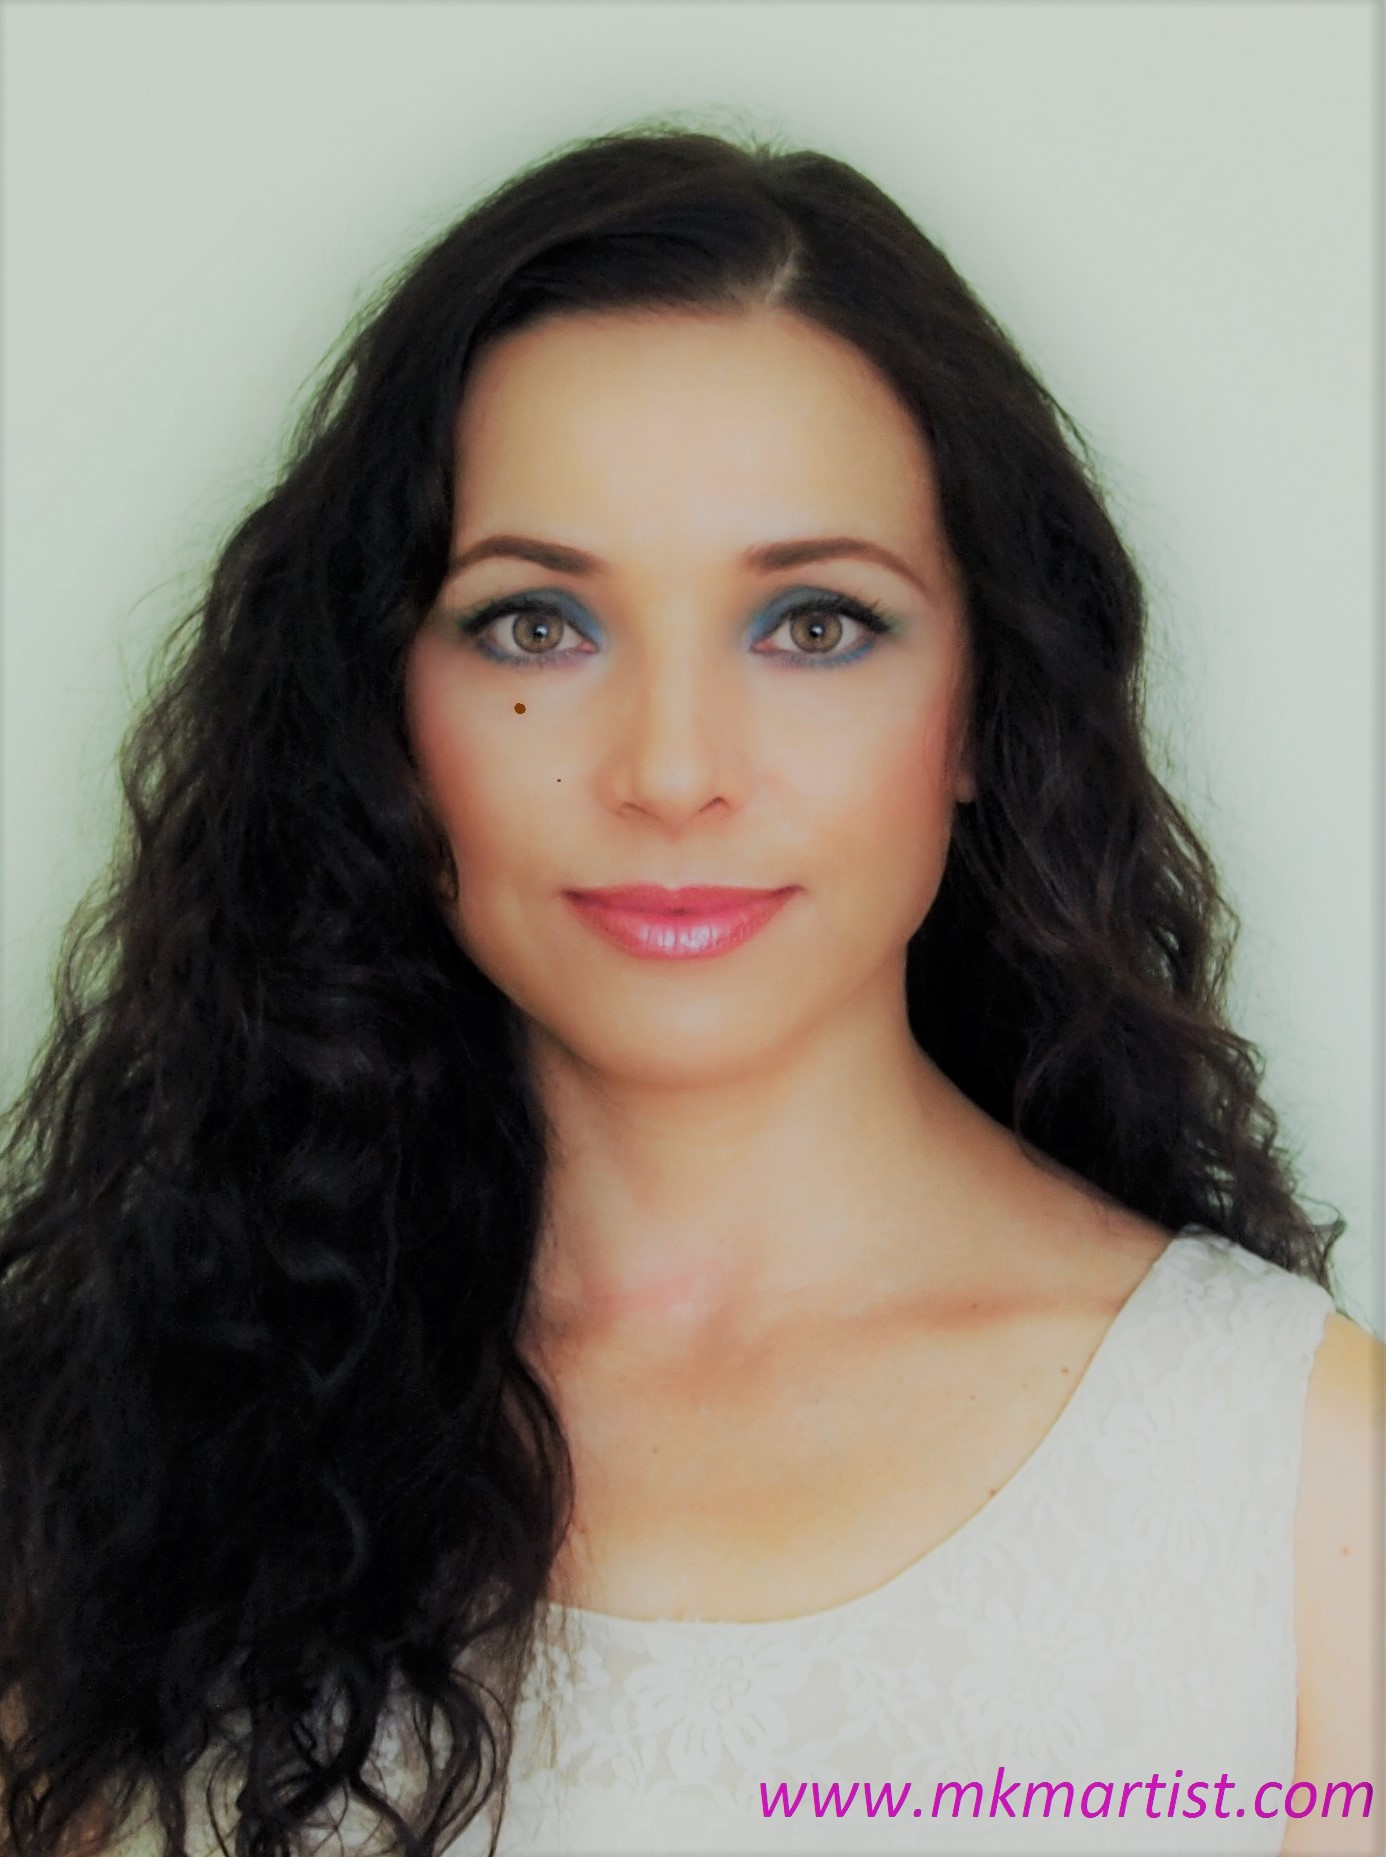 Margita Capkovicova / MKM Autorky / MKM Artist